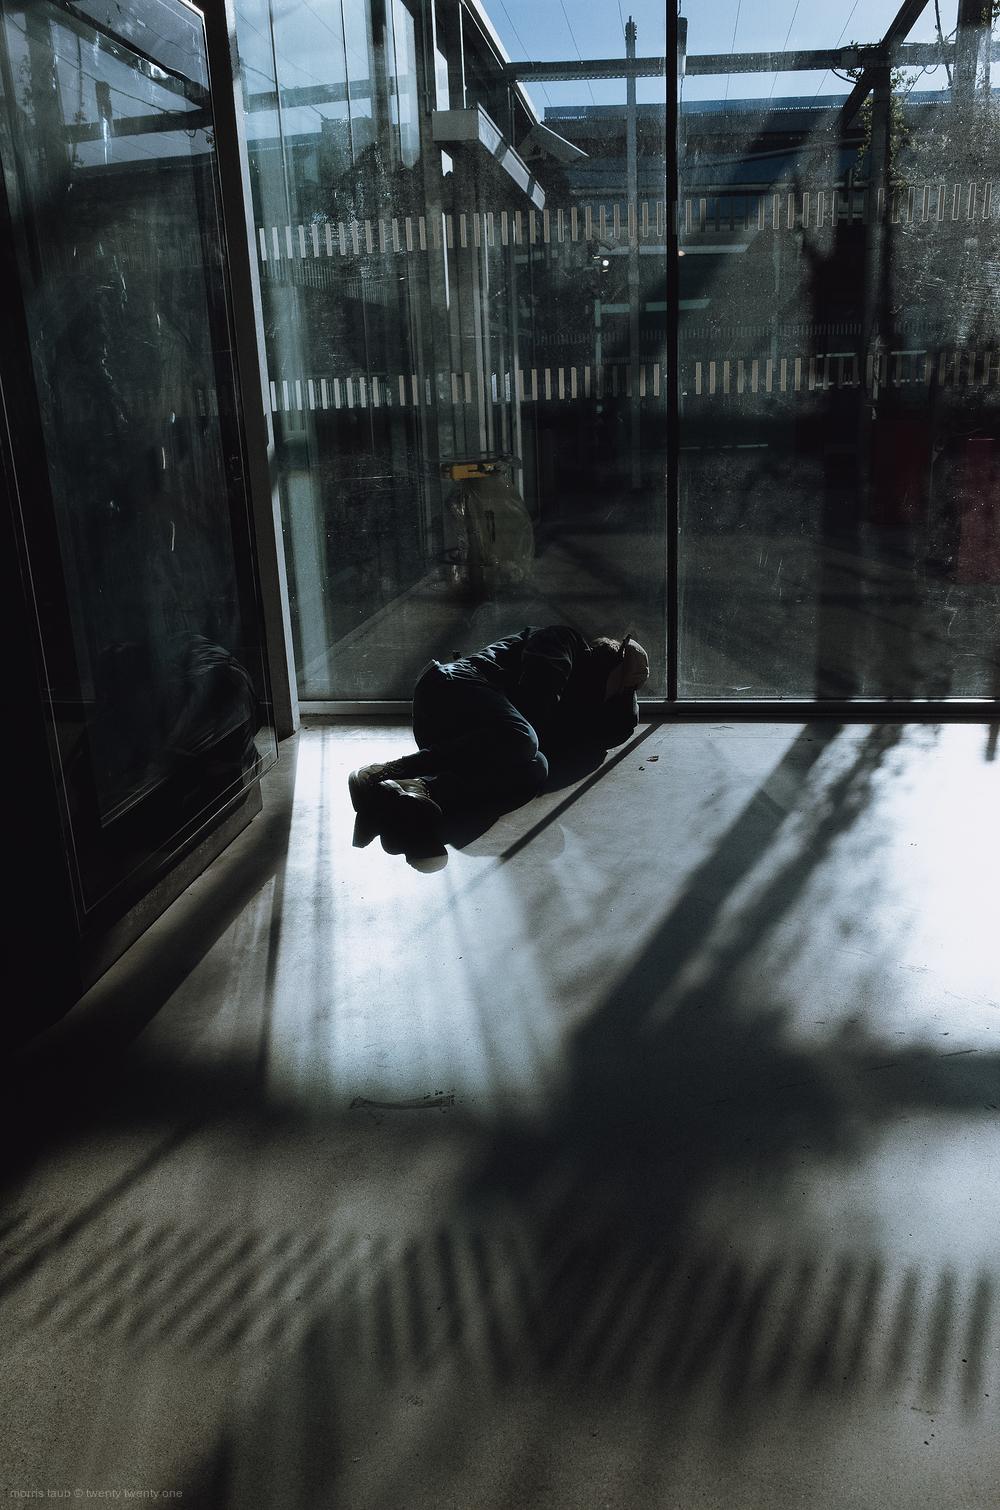 Man sleeping on floor in train station.